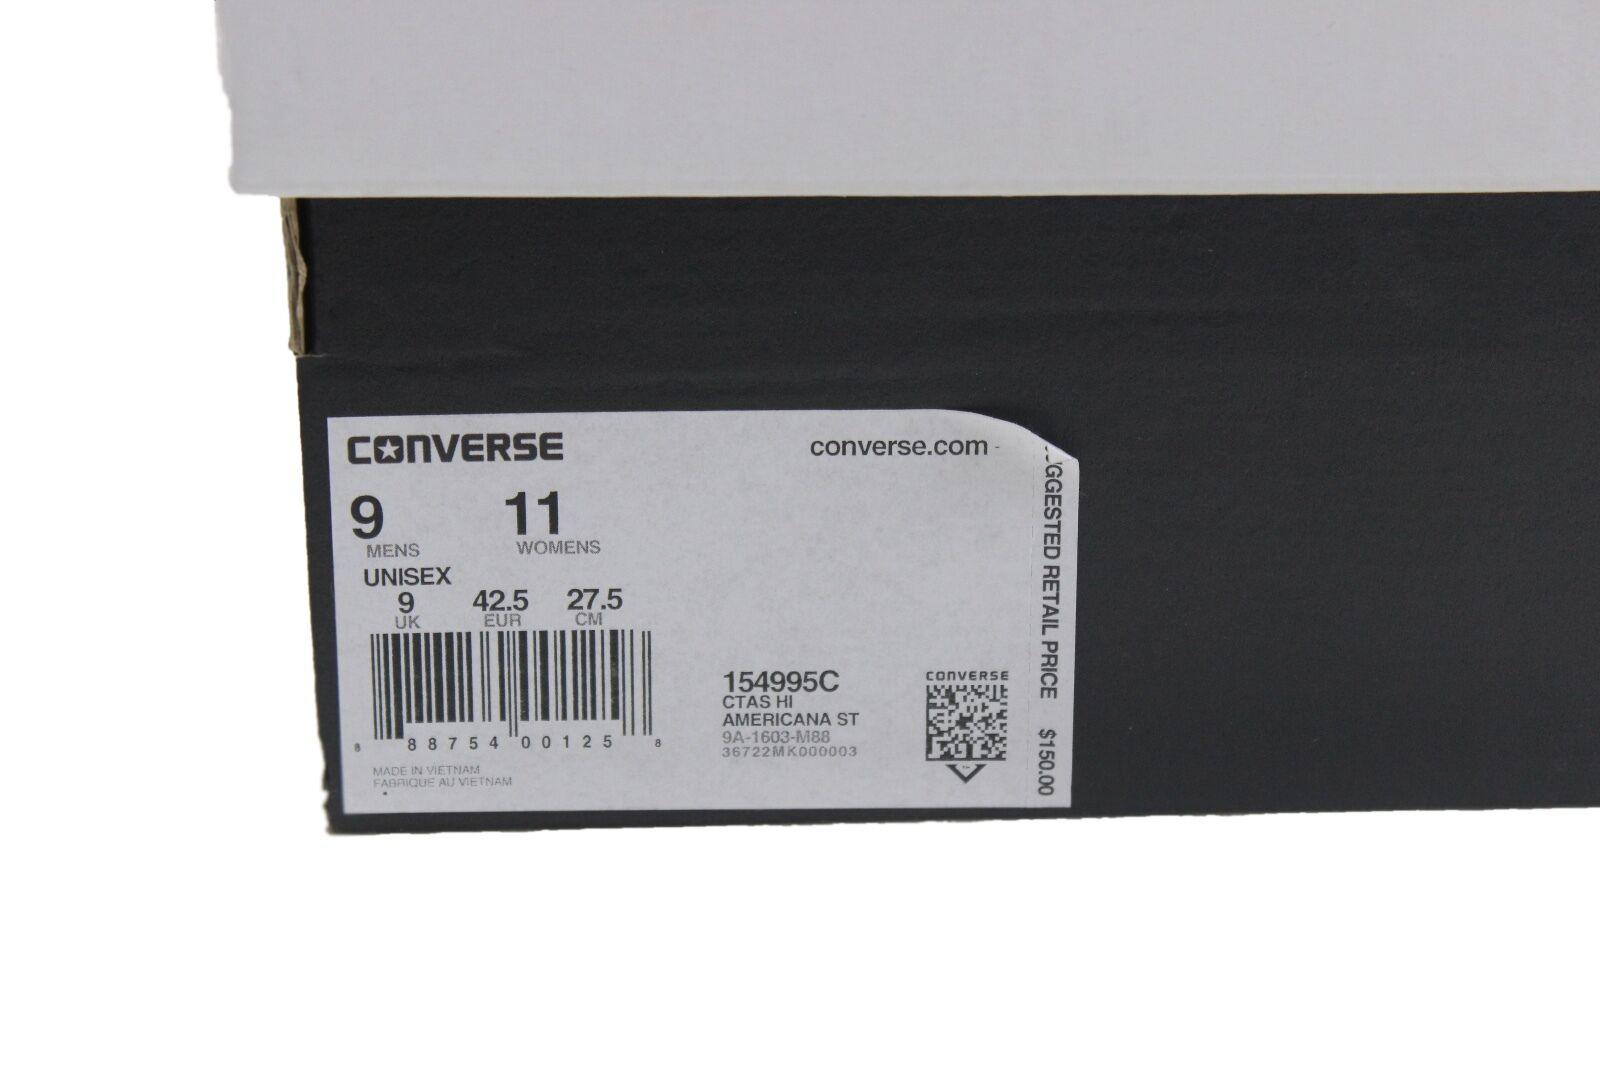 Converse boston chuck taylor hohem americana streifen boston Converse ausgabe 154995c 150 usa b2257c